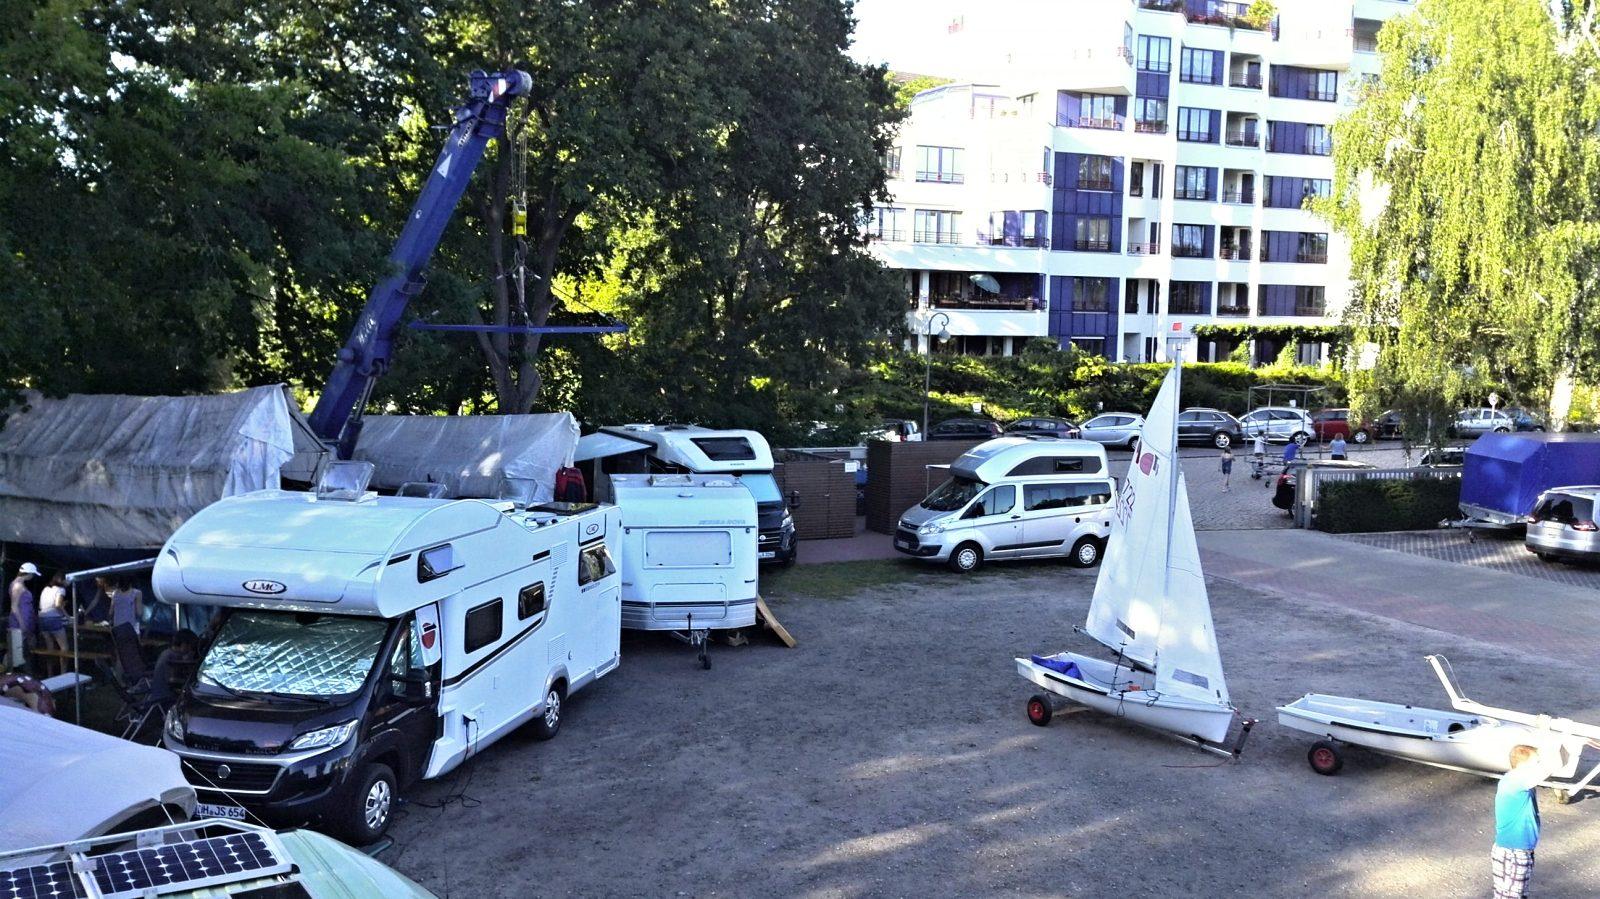 SC Gothia Clubgelände: WoBo, Caravan, Zelt und Teeny Parkplatz - Photo © SailingAnarchy.de 2016